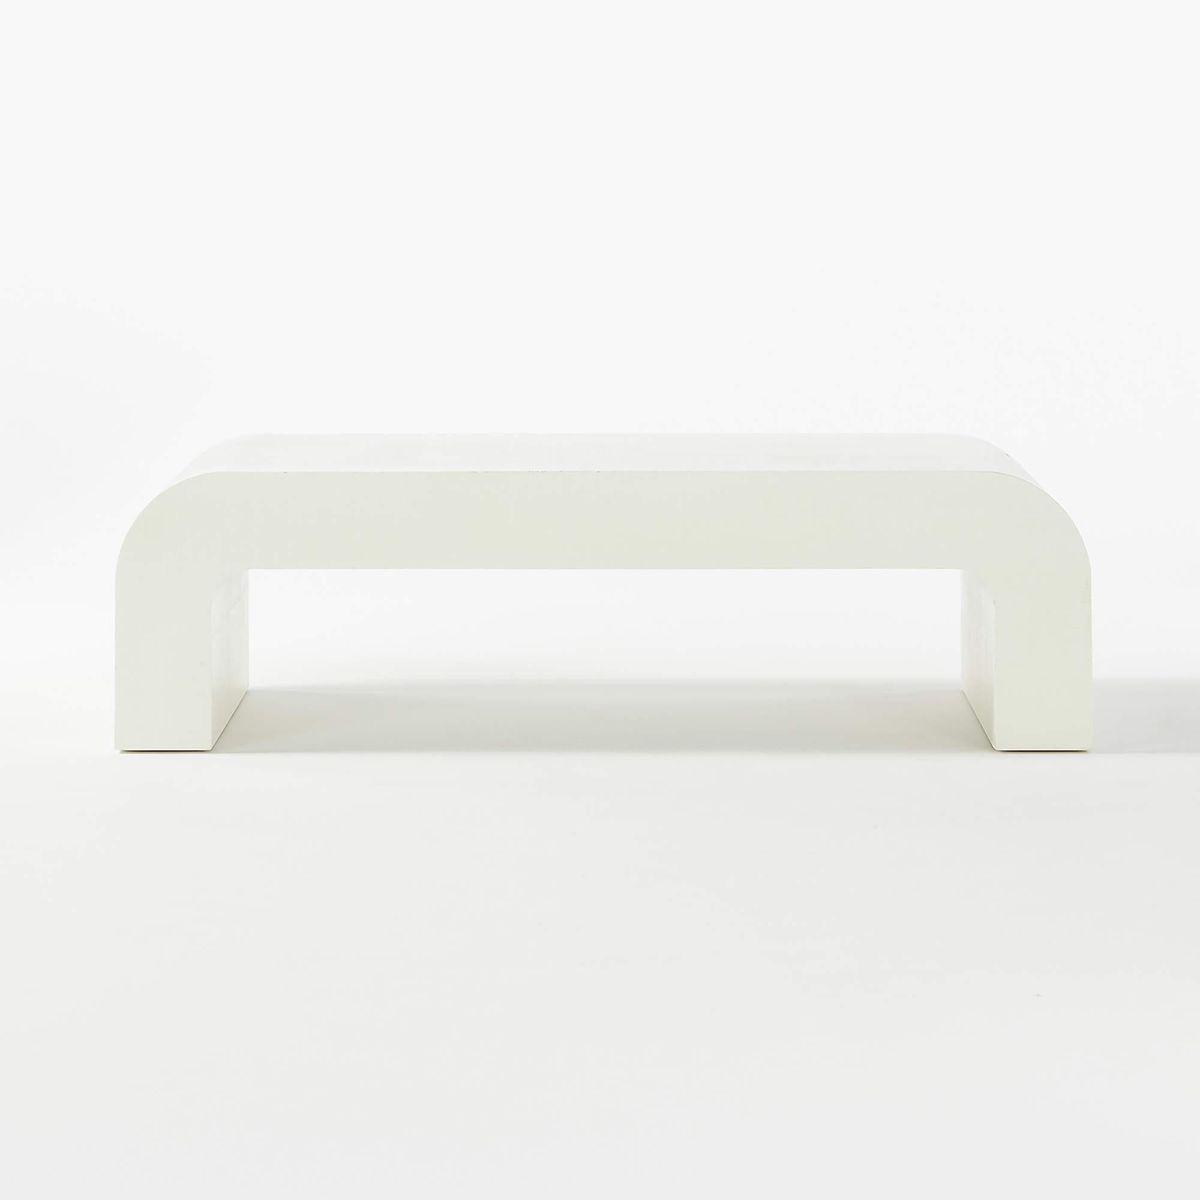 Horseshoe Ivory Lacquered Rectangular Coffee Table